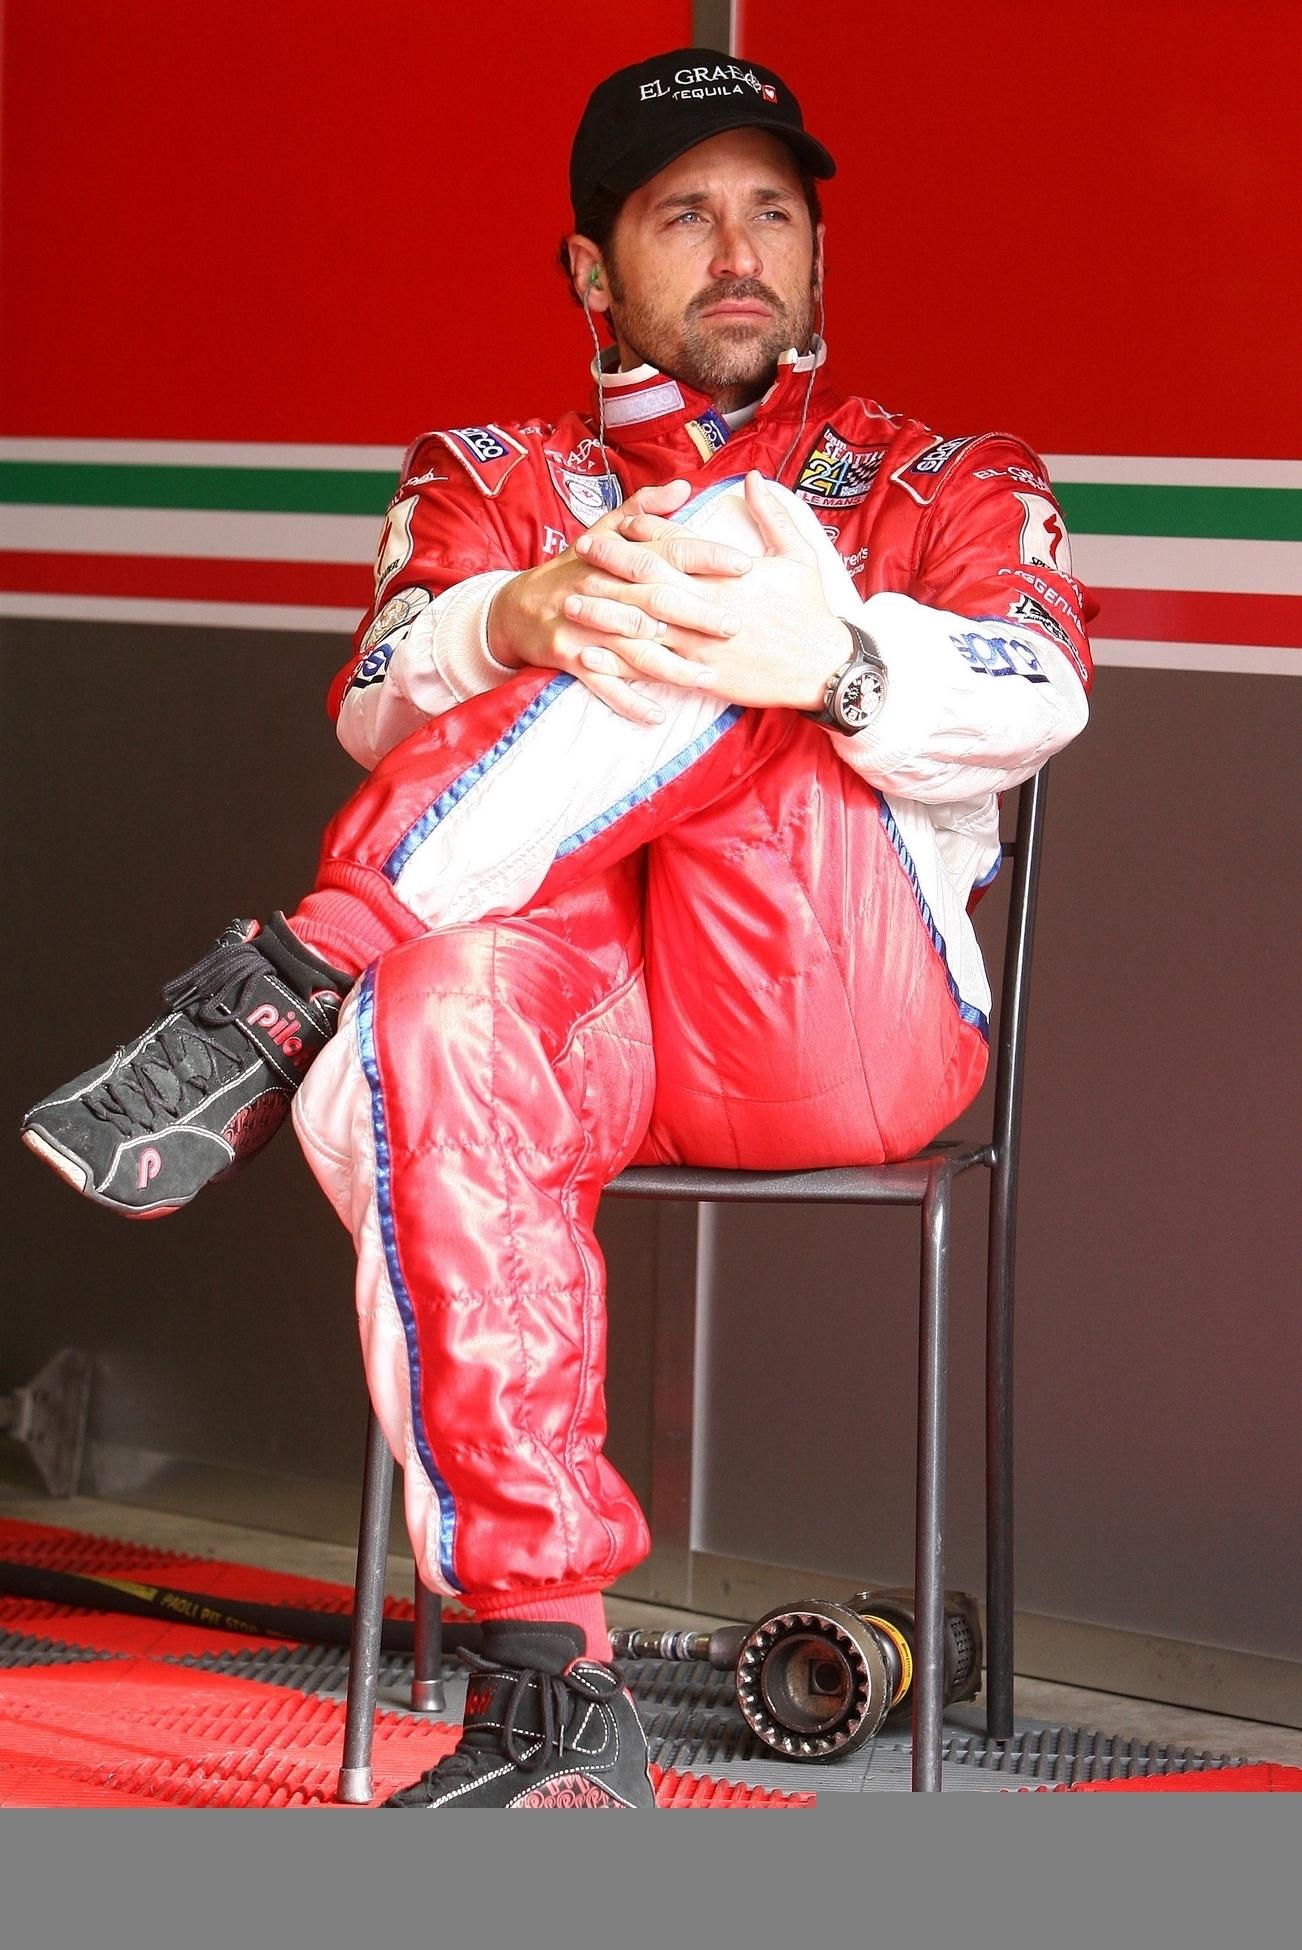 Patrick at Le Mans- 14th June - patrick-dempsey photo